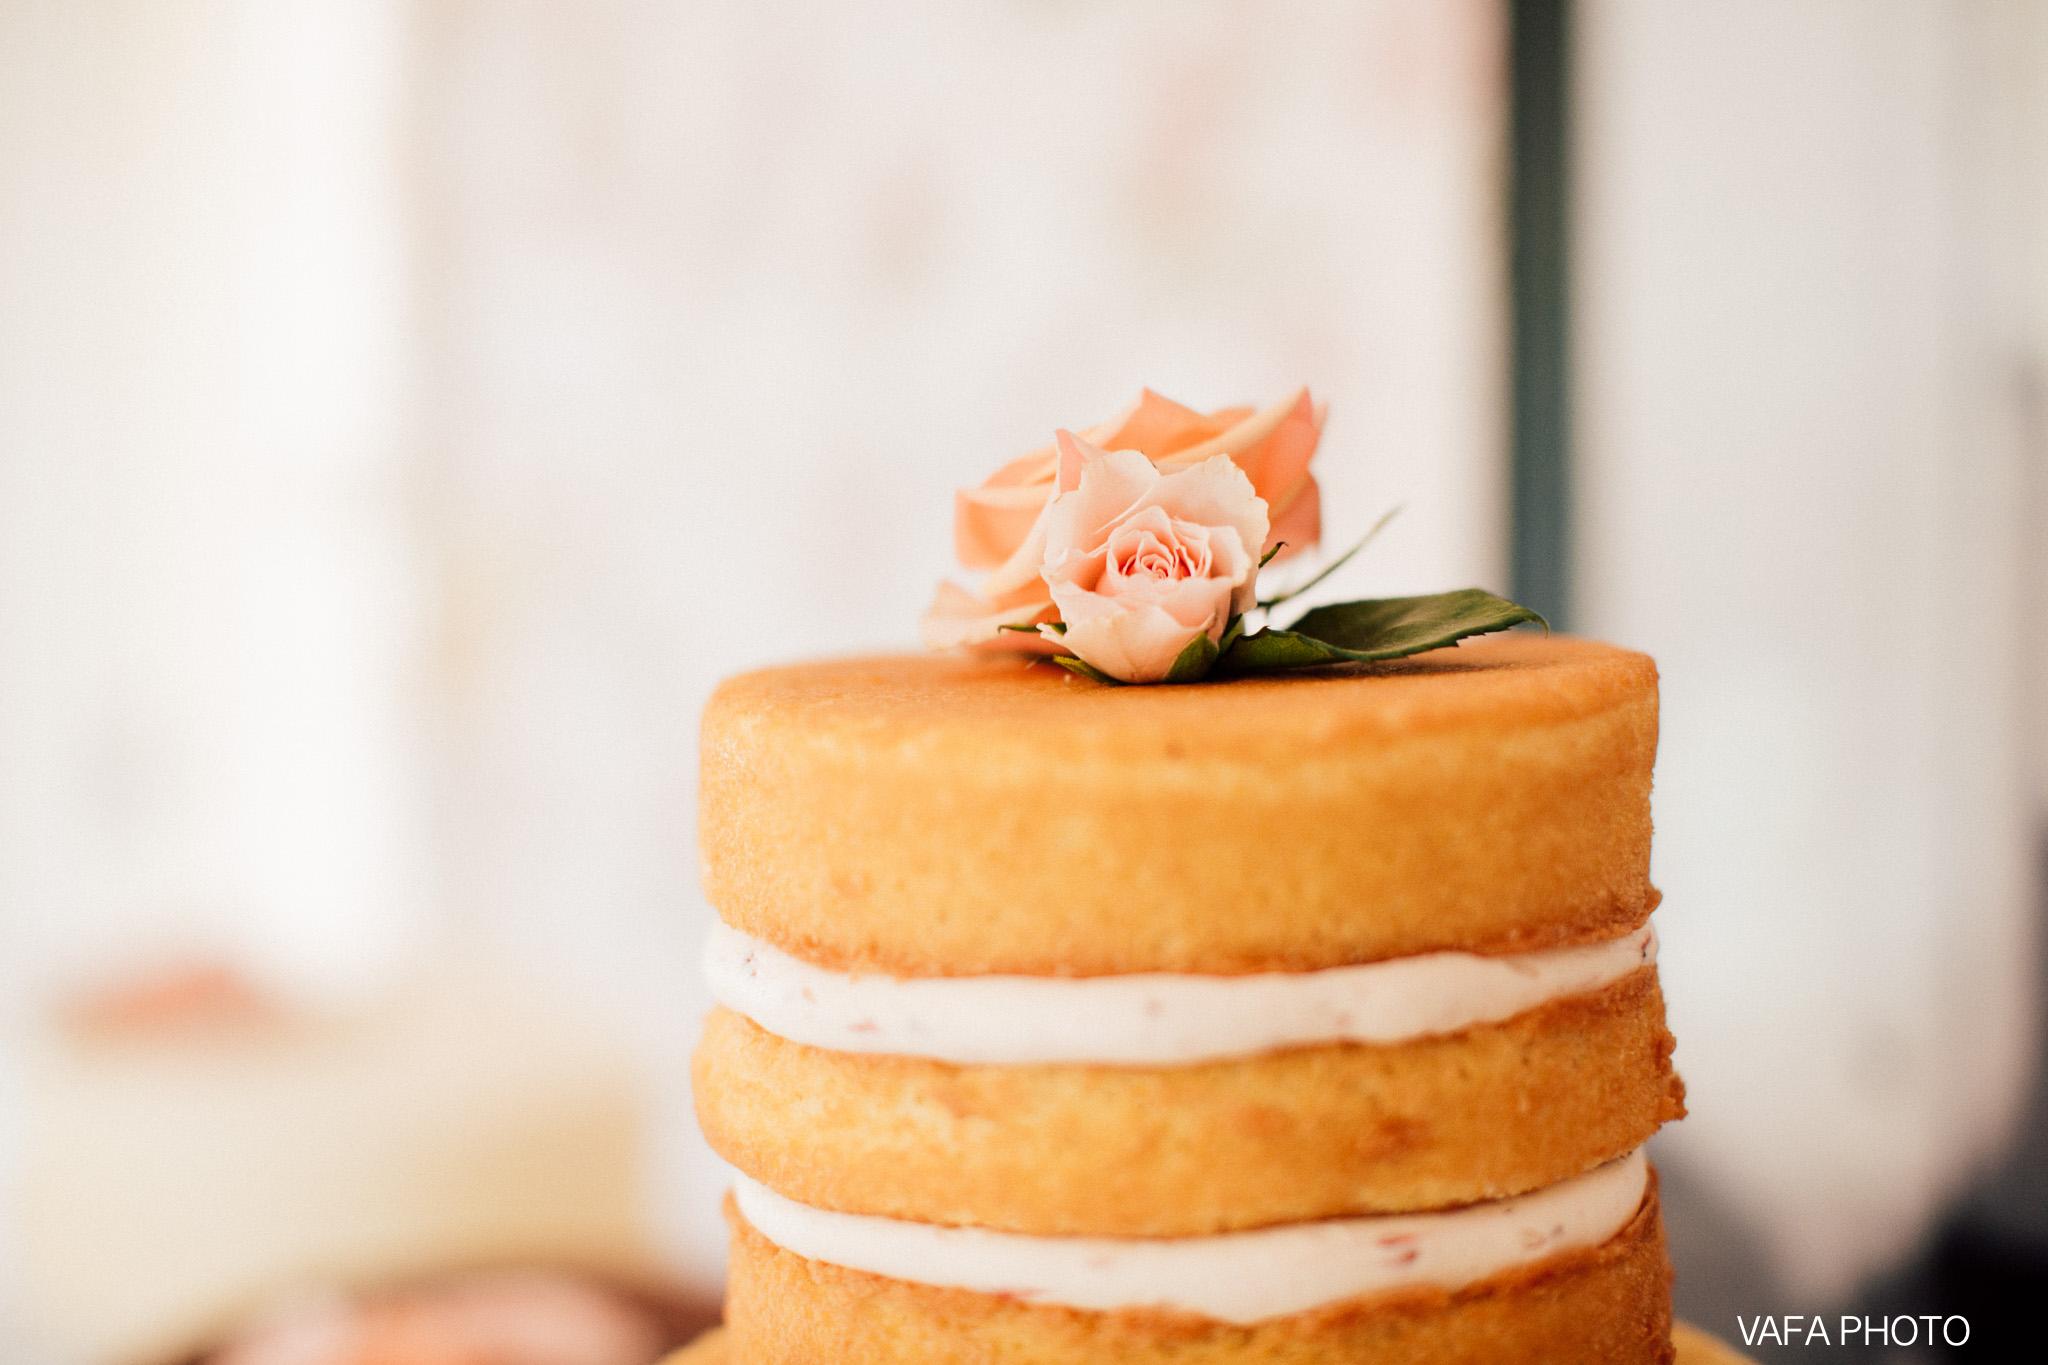 The-Felt-Estate-Wedding-Kailie-David-Vafa-Photo-805.jpg